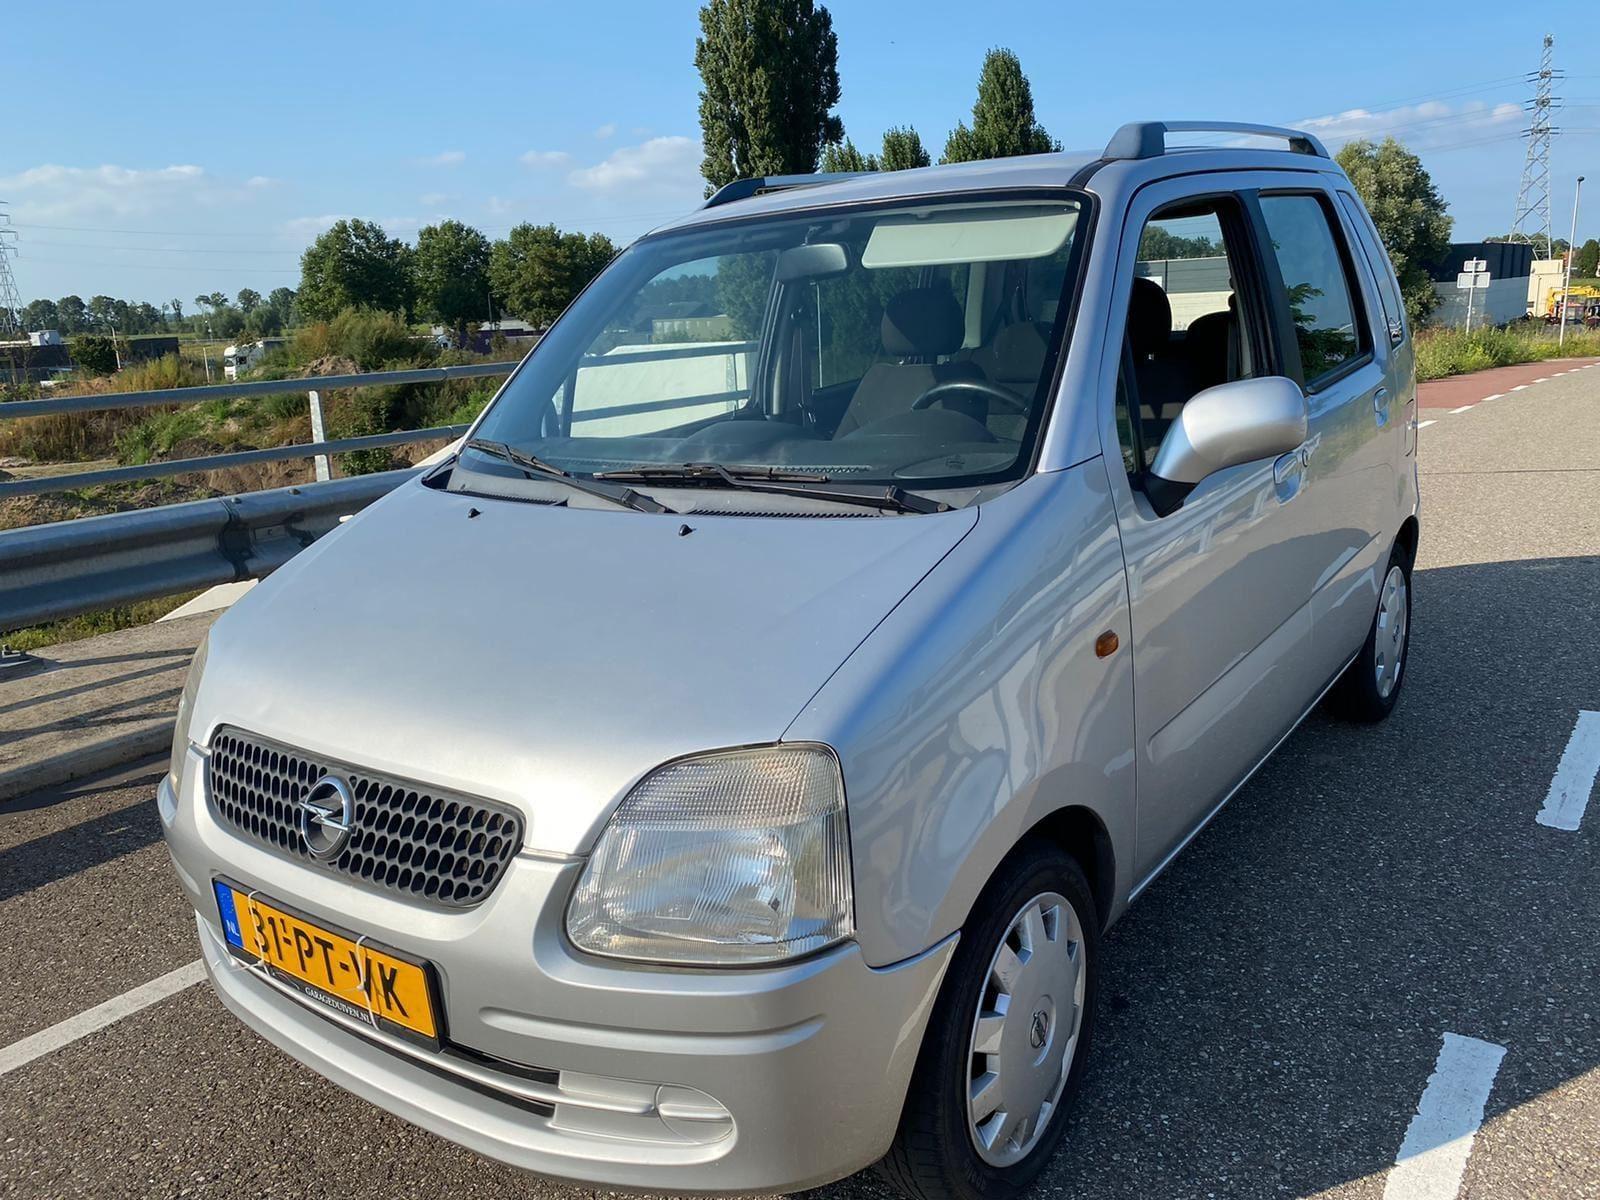 Opel Agila occasion - Gelderland Cars B.V.Zutphen